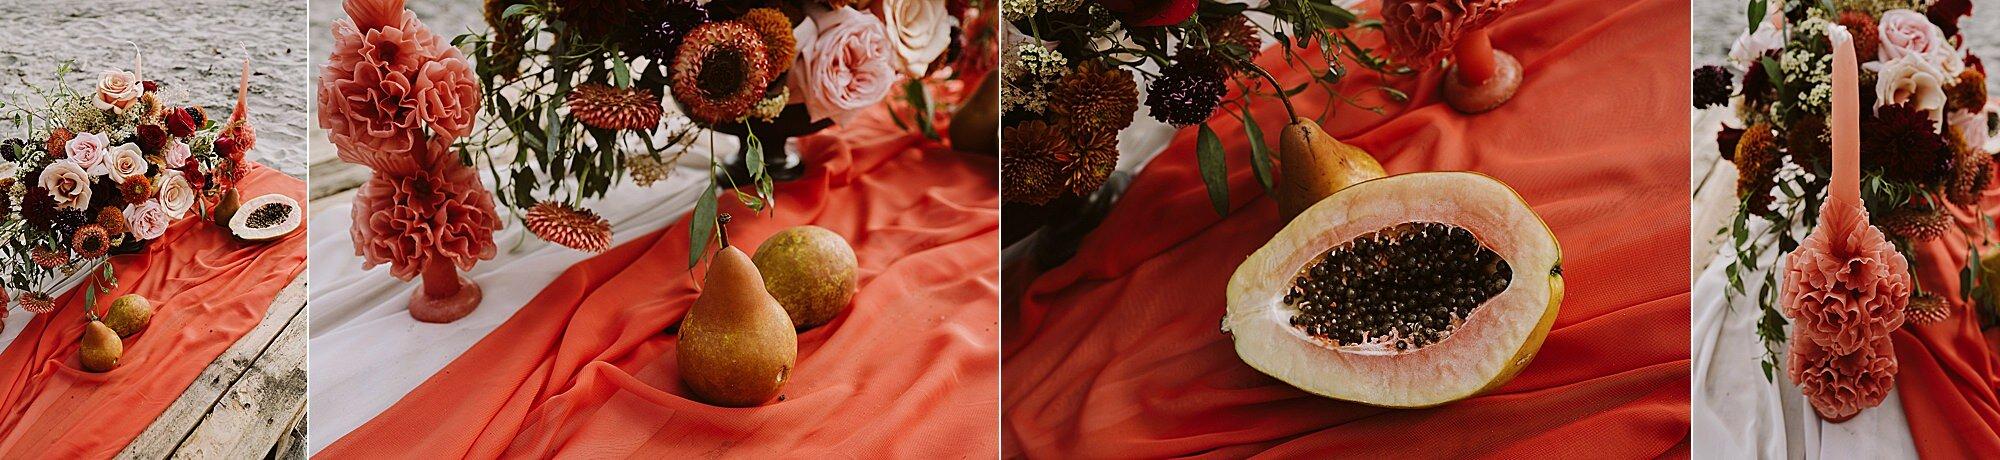 ELOPING_IN_CALIFORNIA_ALFONSO_FLORES_DESTINATION_WEDDING_PHOTOGRAPHY-28.jpg